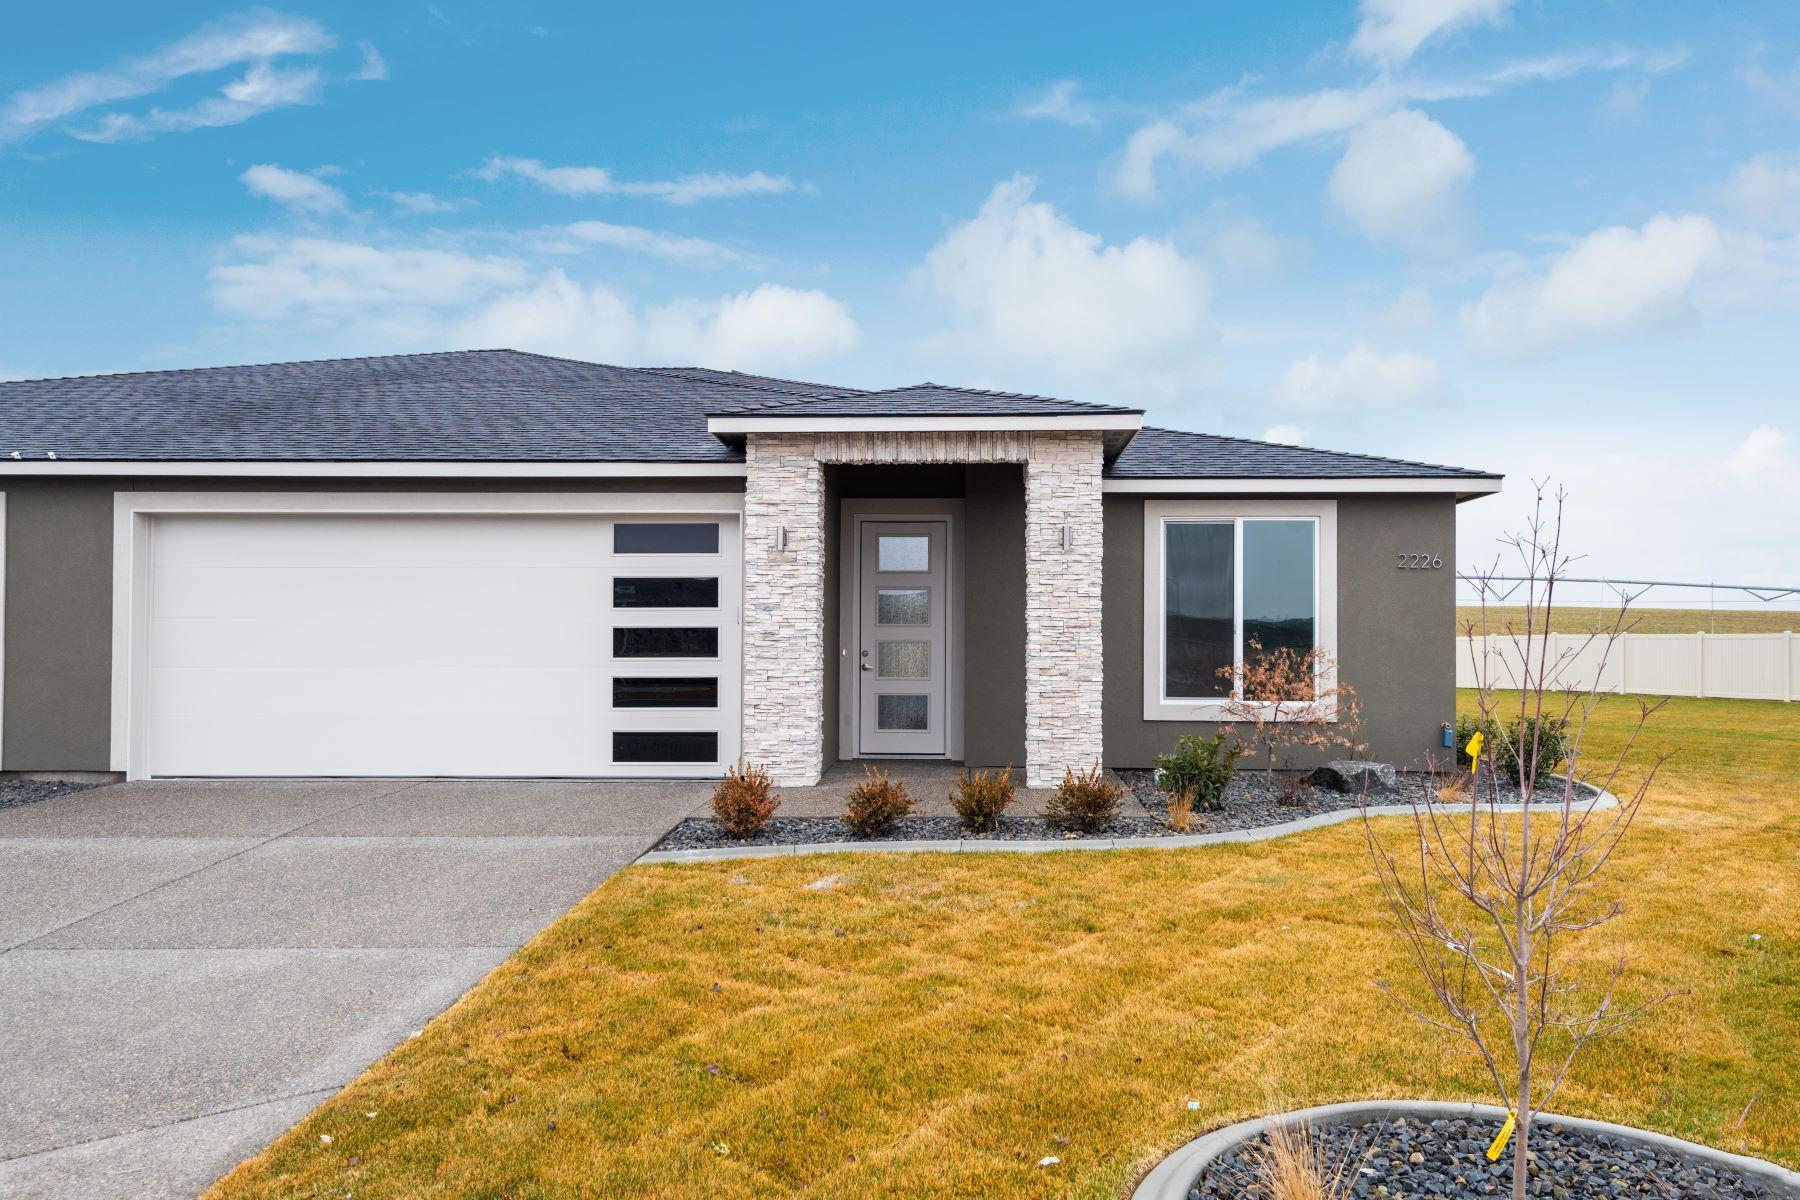 townhouses for Sale at Low Maintenance Golf Community 2232 Veneto Street, Richland, Washington 99352 United States